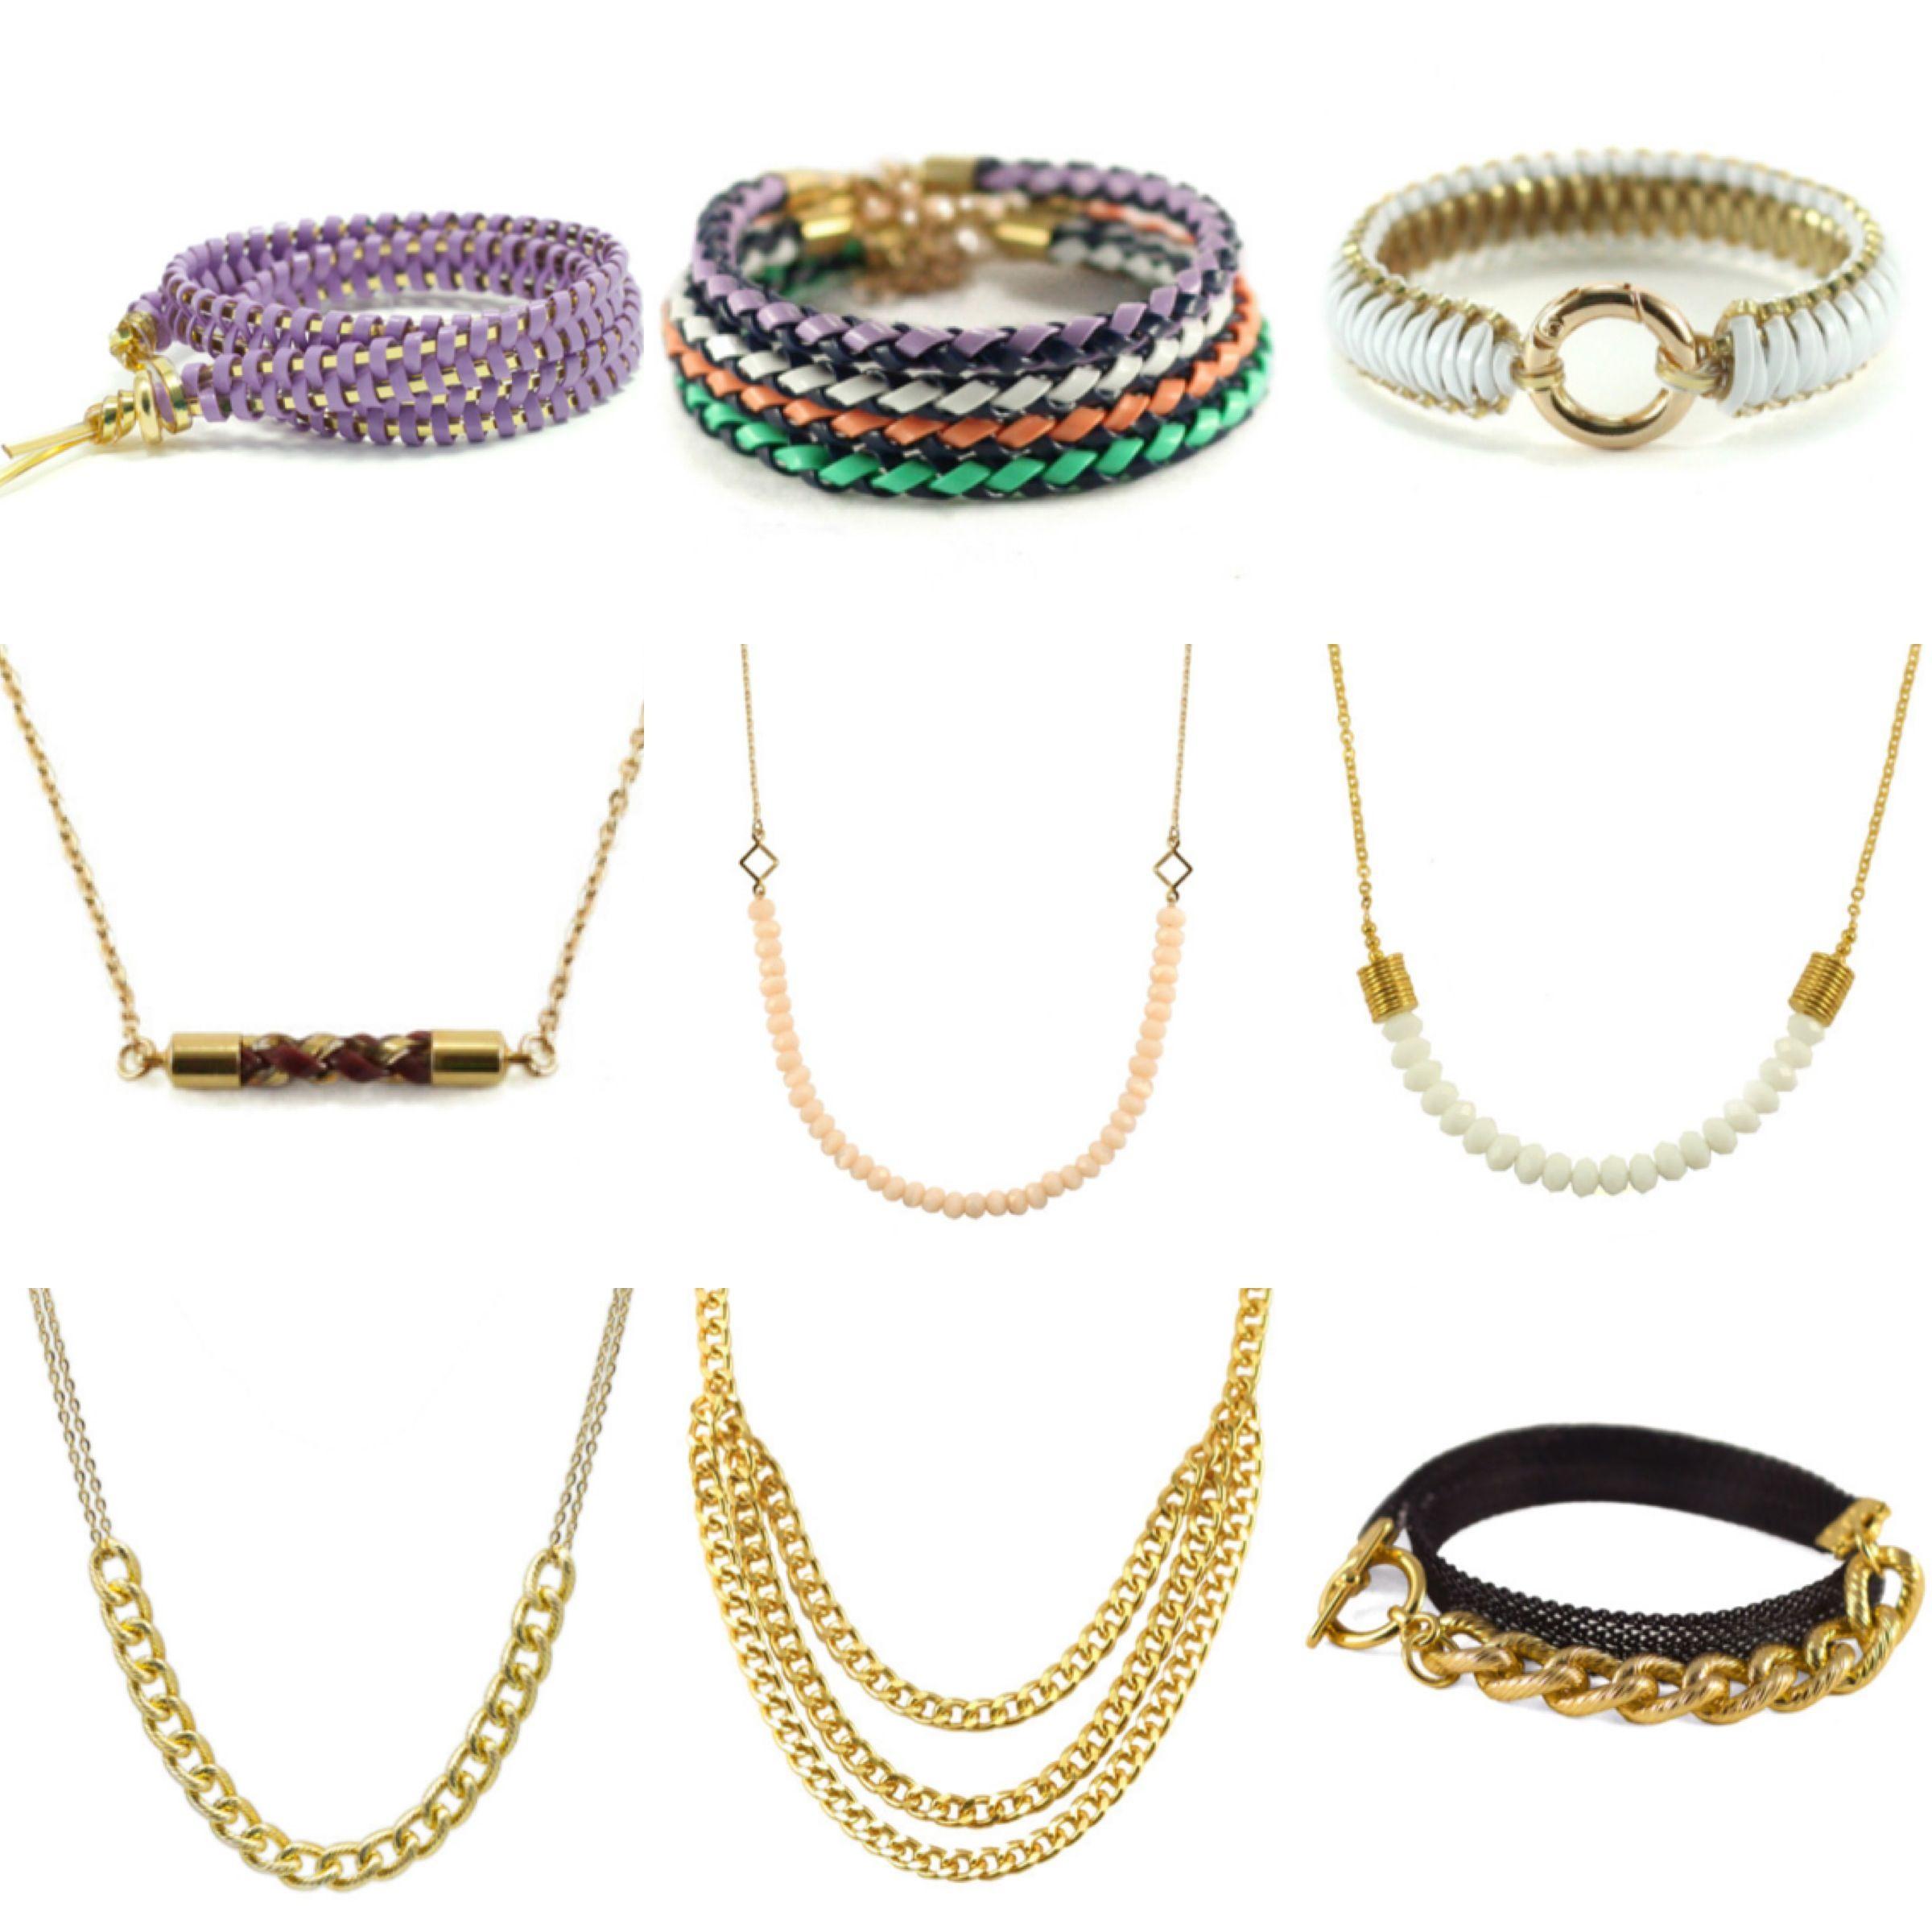 Diy jewelry helloberry